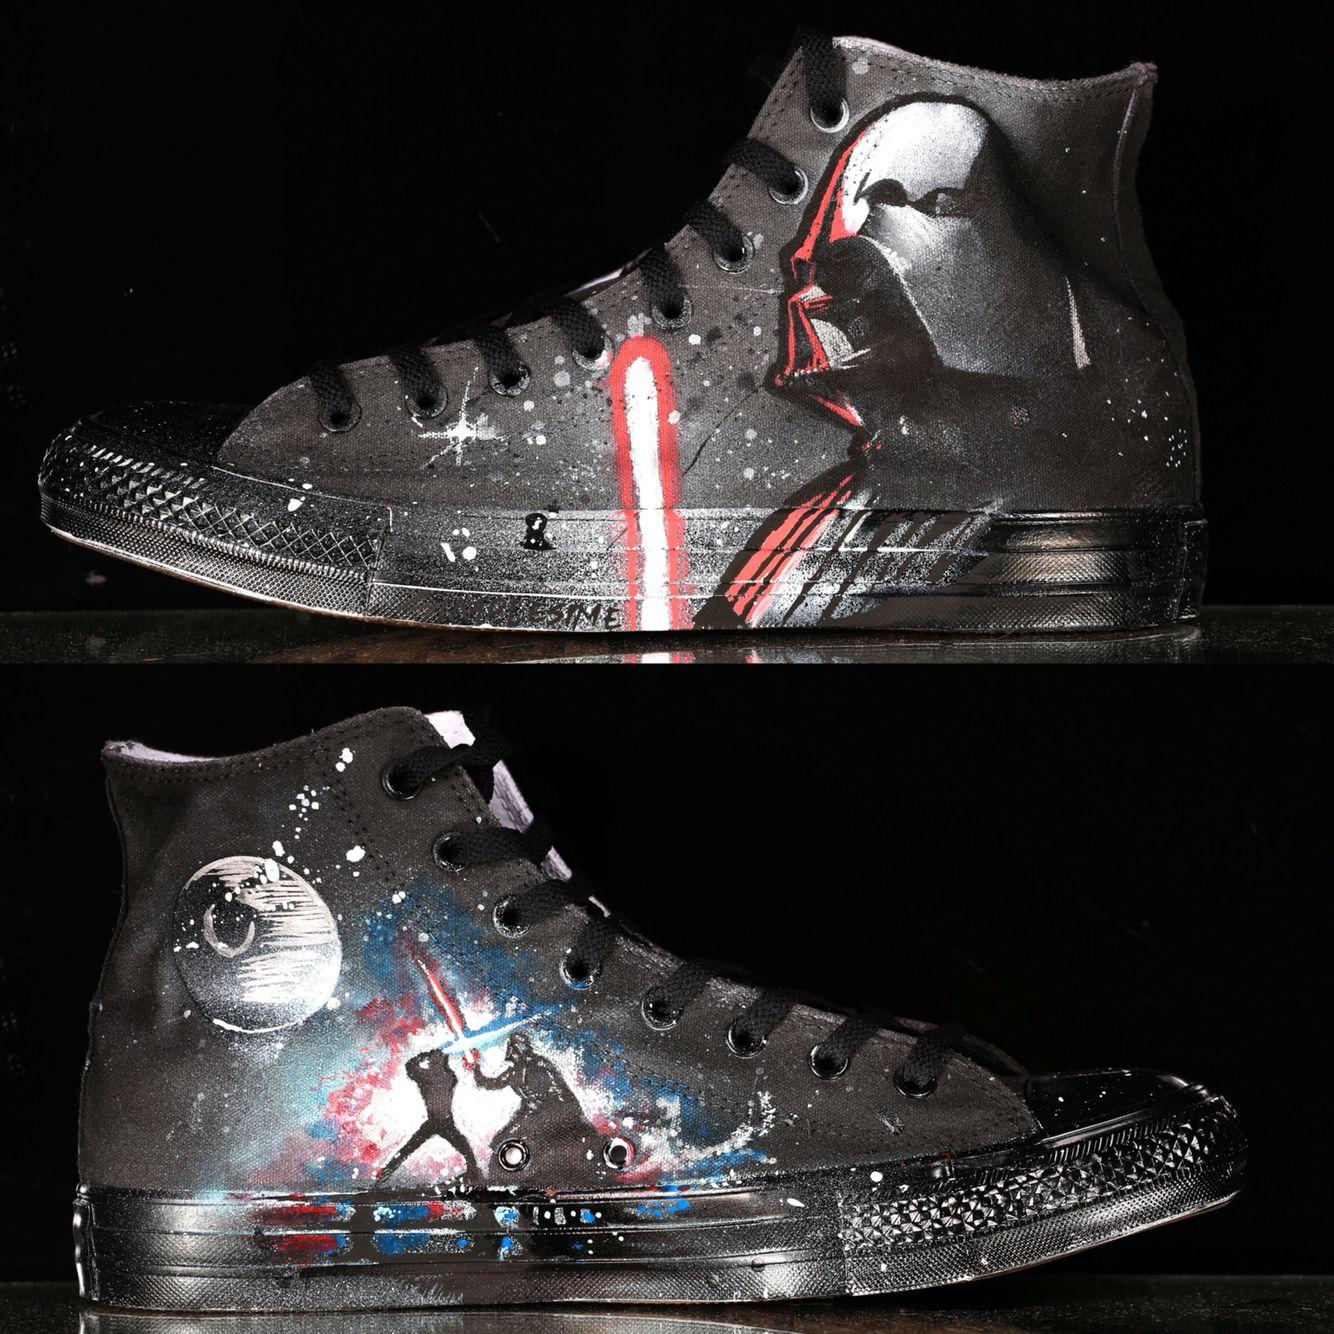 9eac3de6cb7  ConverseShoes 2 2 custom Star Wars chucks painted by  Simplesime